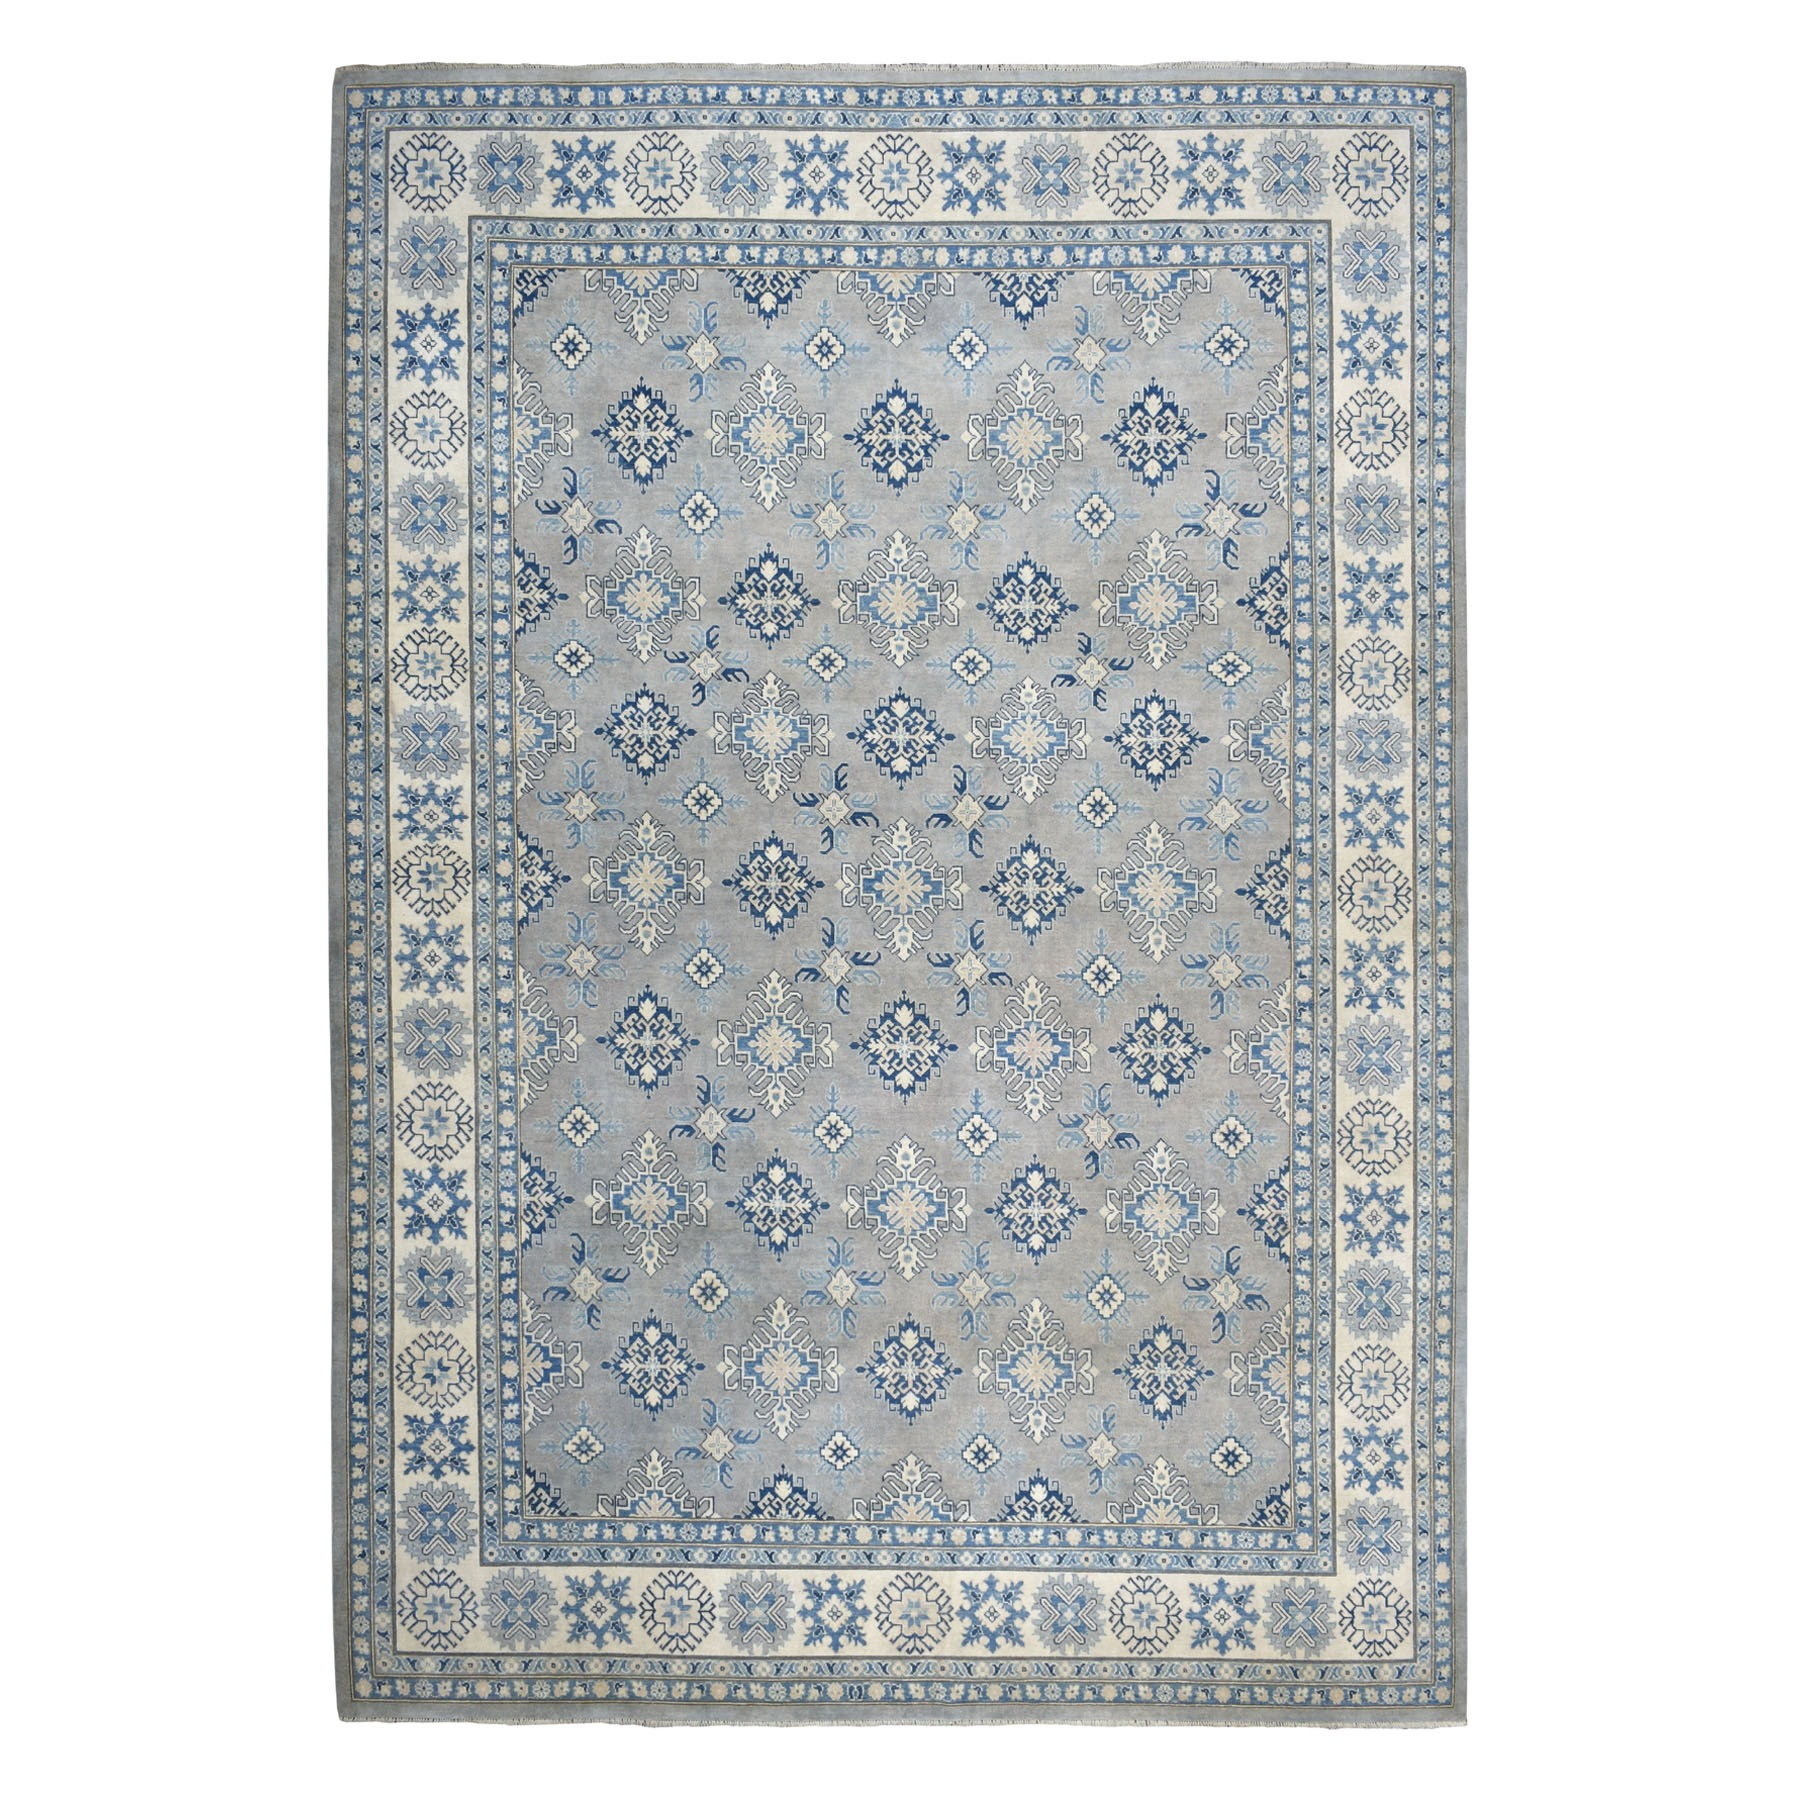 "9'8""X13'8"" Gray Vintage Look Kazak Geometric Design Pure Wool Hand Knotted Oriental Rug moaeb0ae"